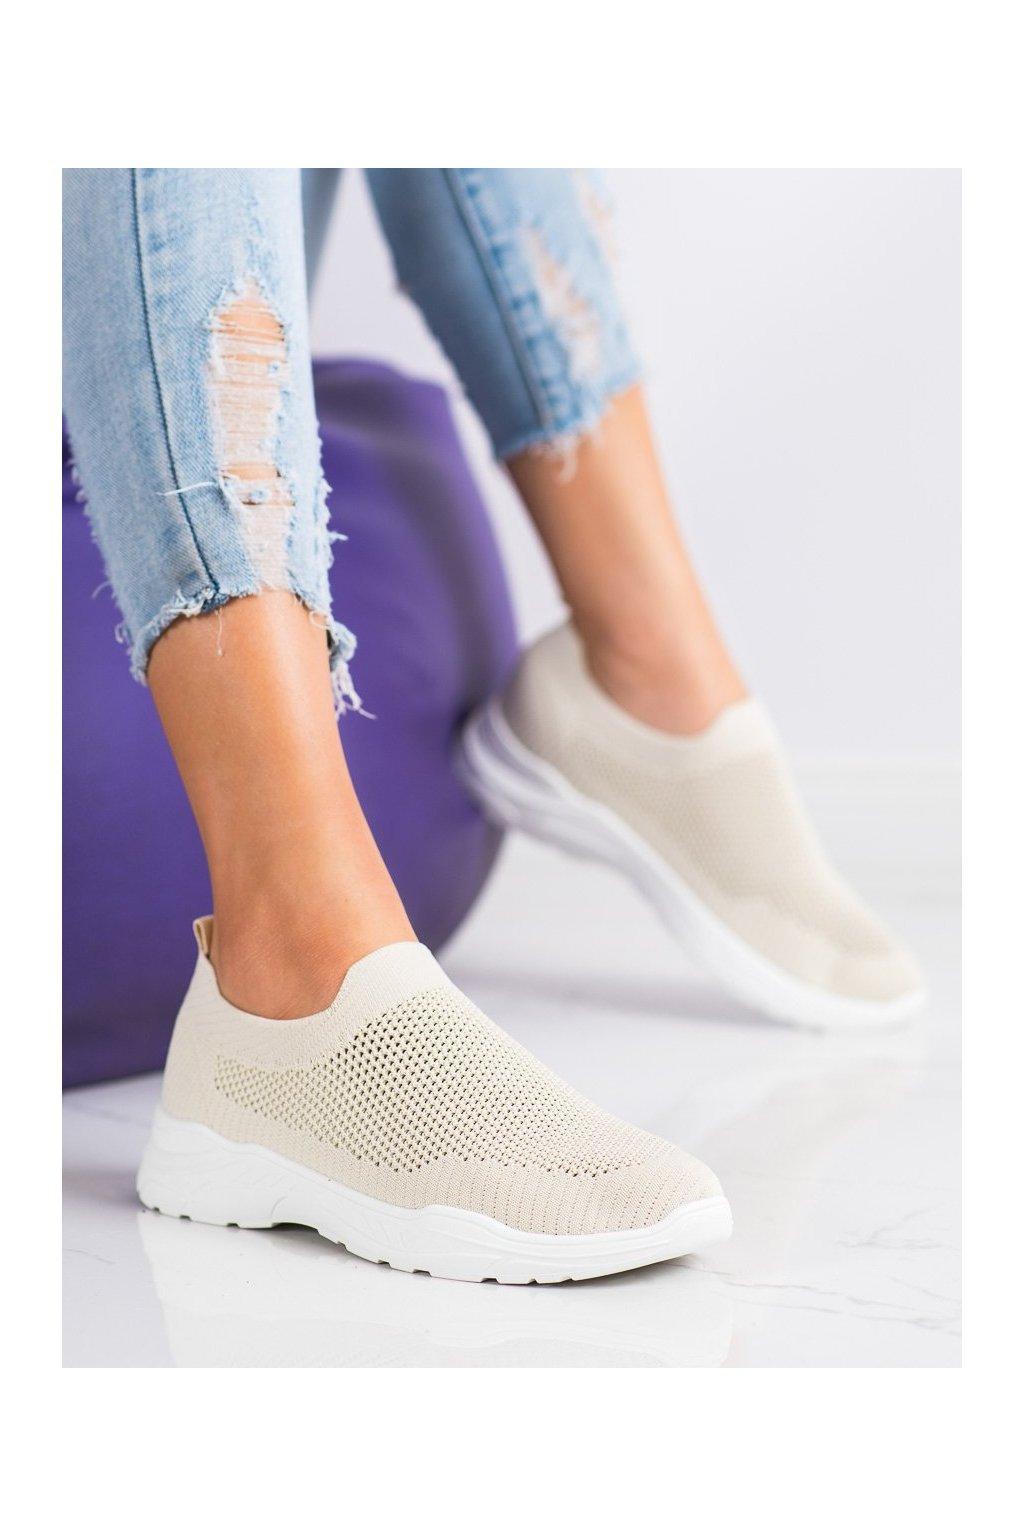 Hnedé tenisky Ideal shoes kod 9865BE